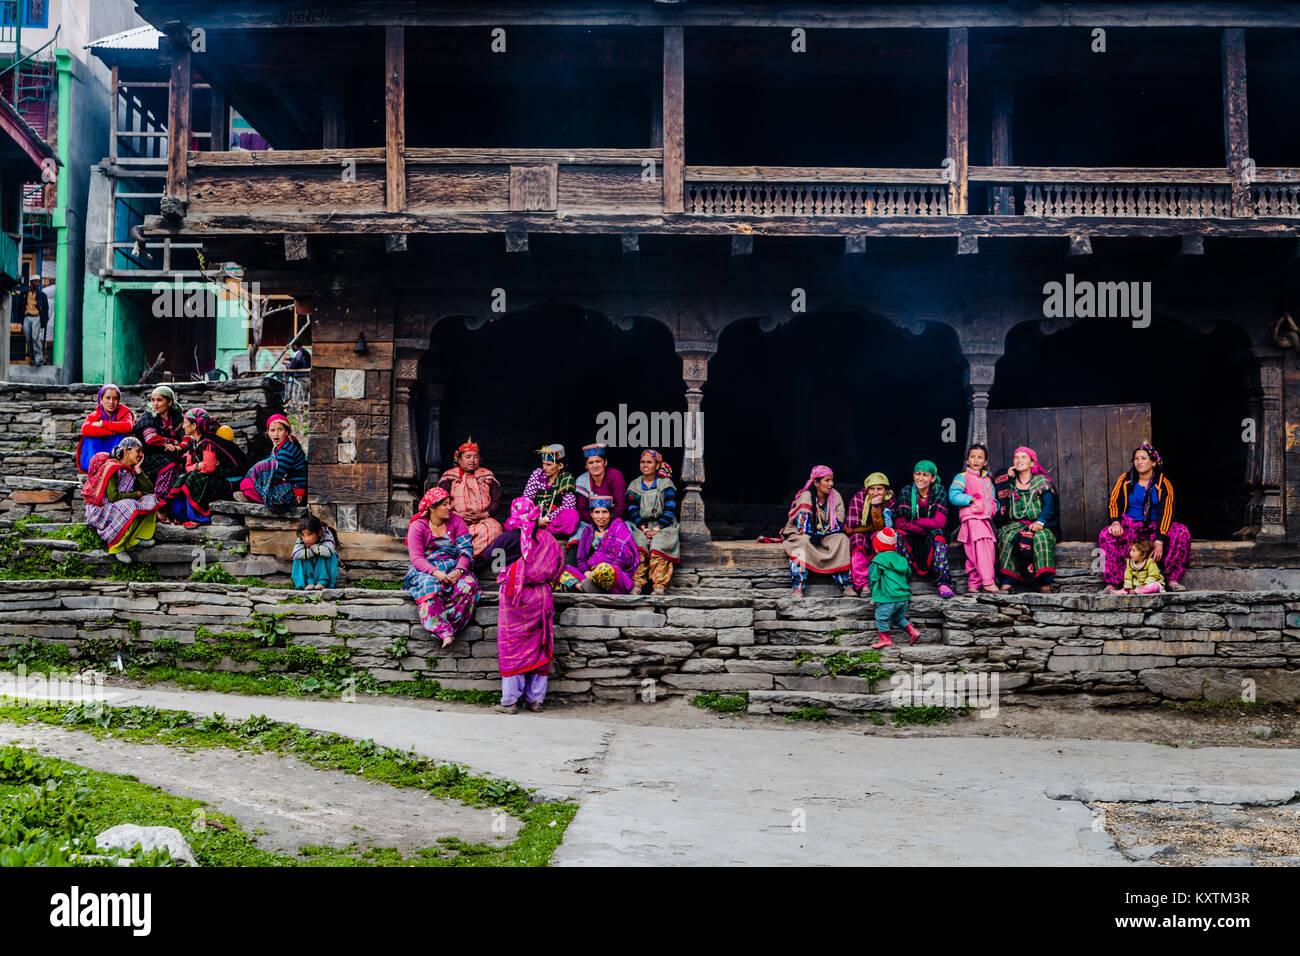 Malana Village - Himachal Pradesh - India © Sauriêl Ltd   Samantha Scholl   fb.com/SaurielPhotography   www.saurielcreative.com Stock Photo